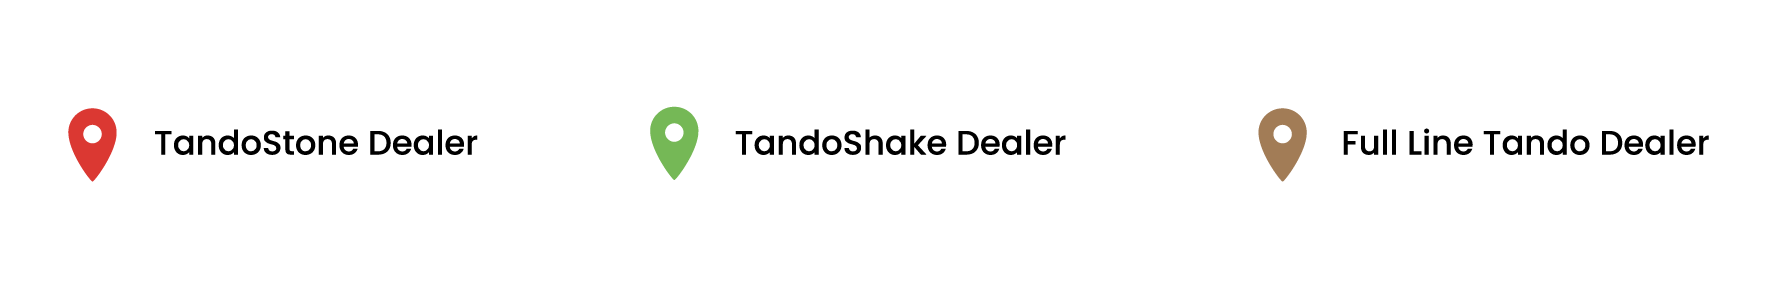 icon-markers-tando